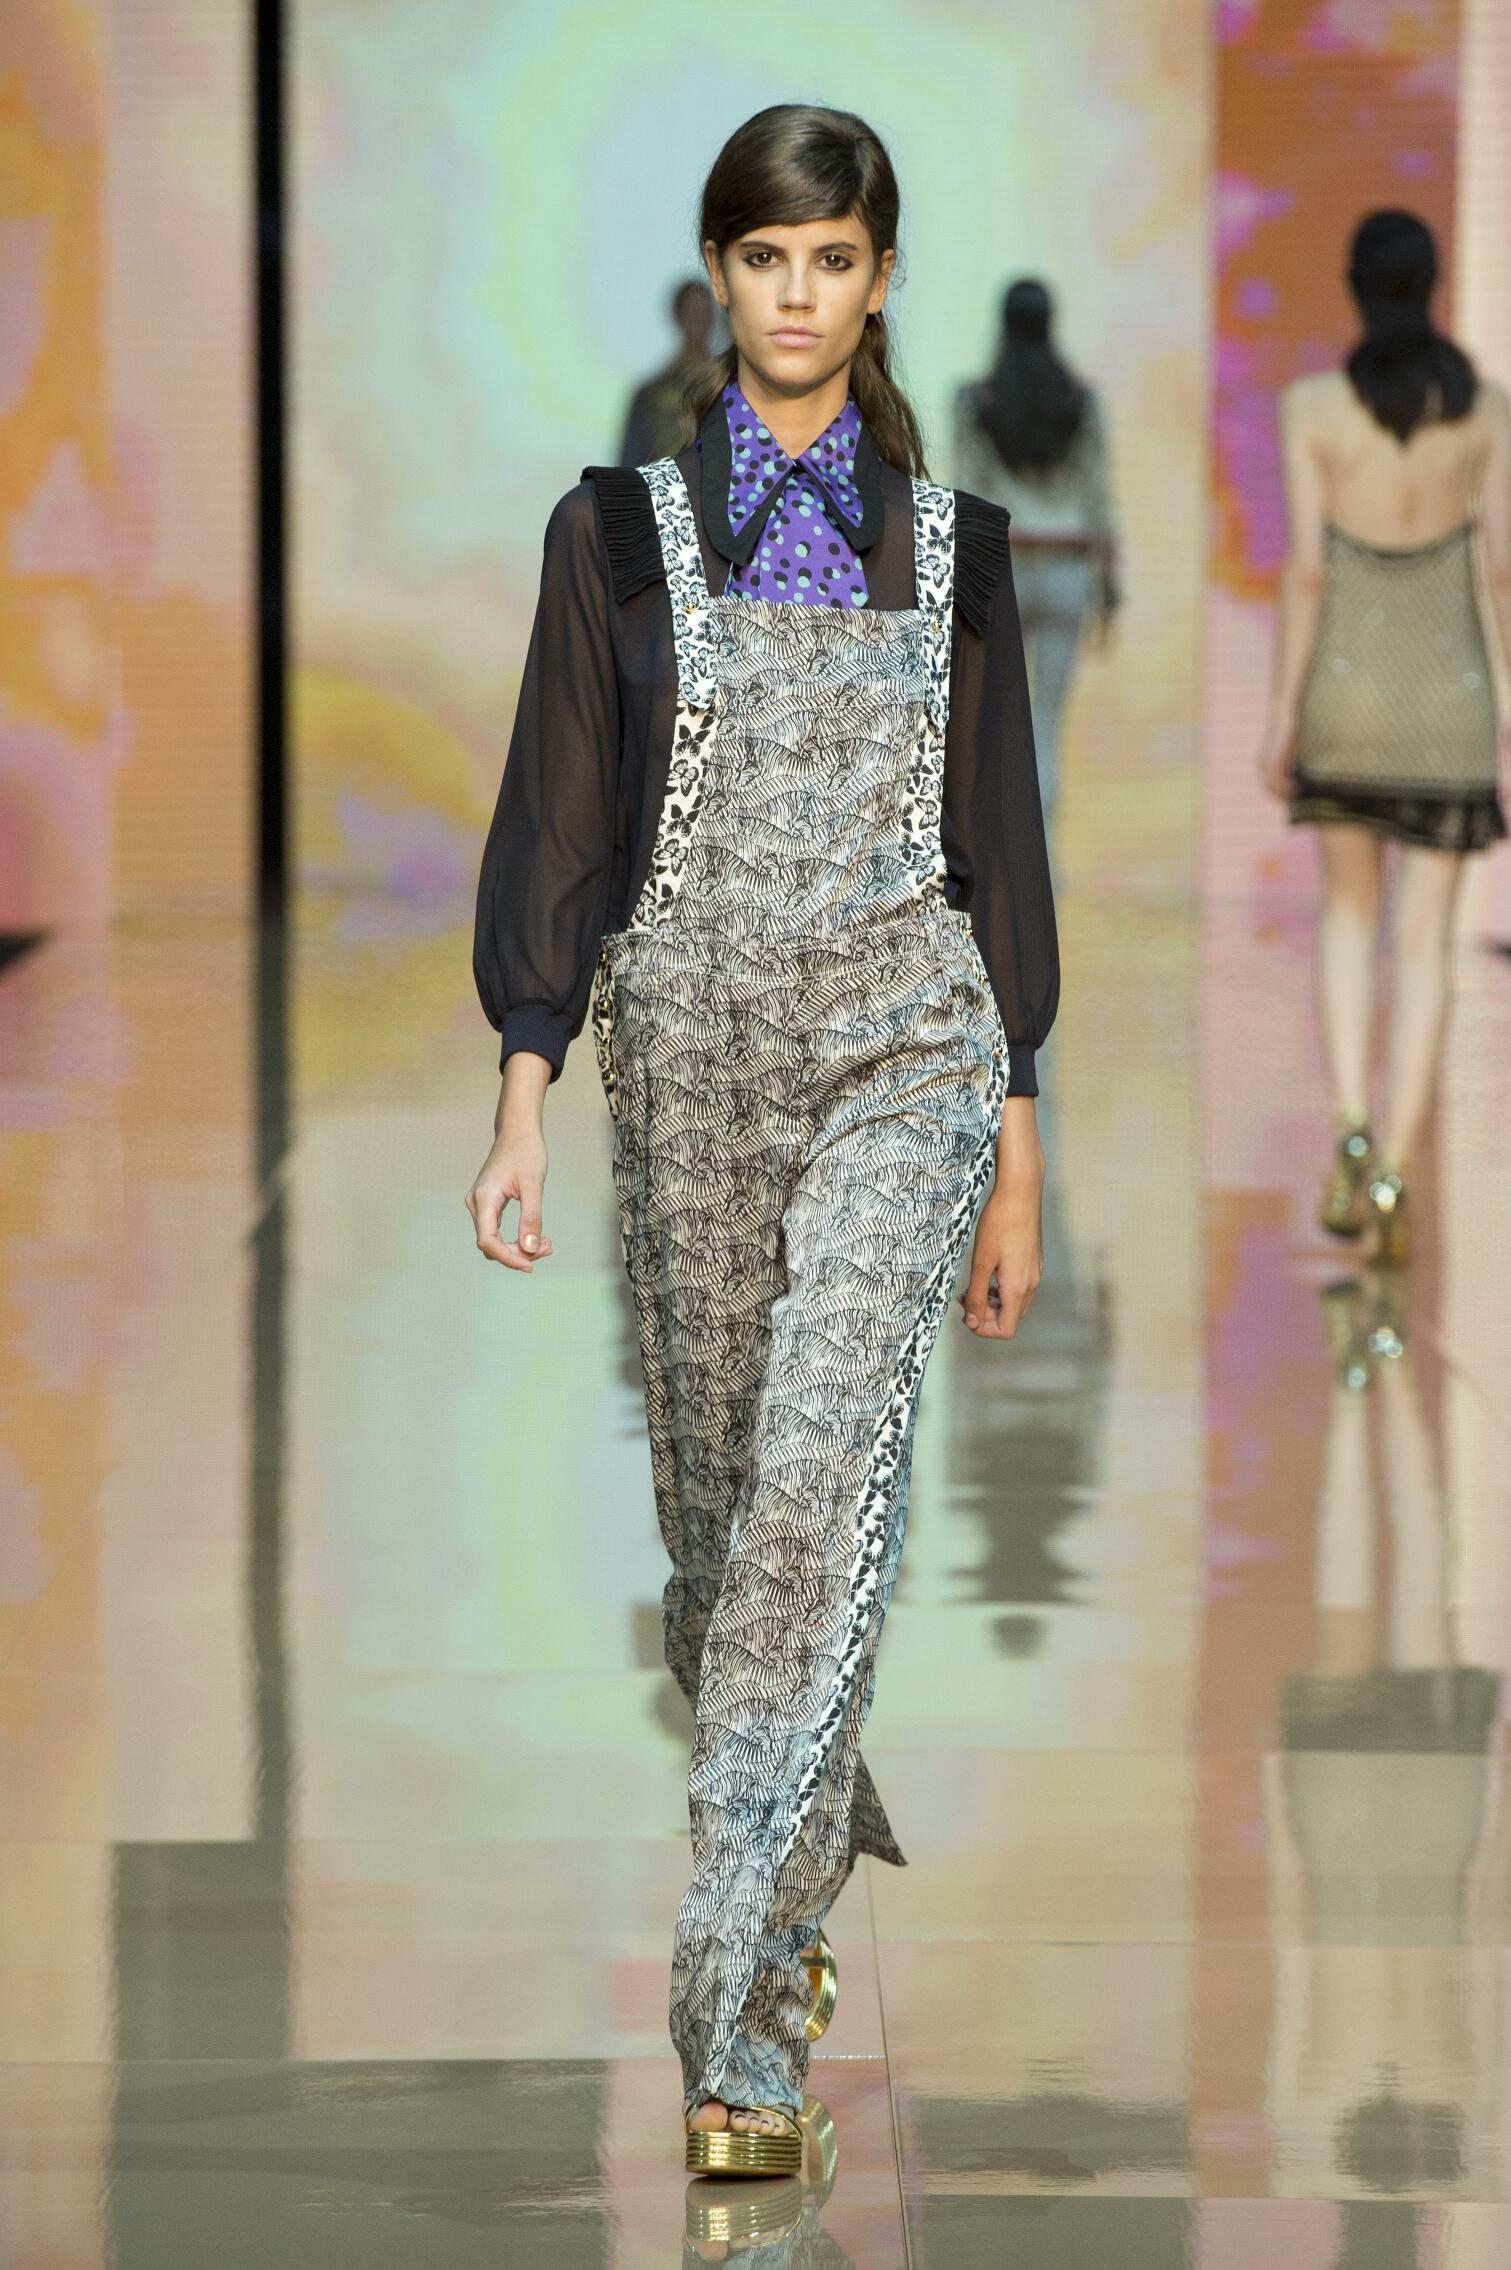 2015 Catwalk Just Cavalli Woman Fashion Show Summer